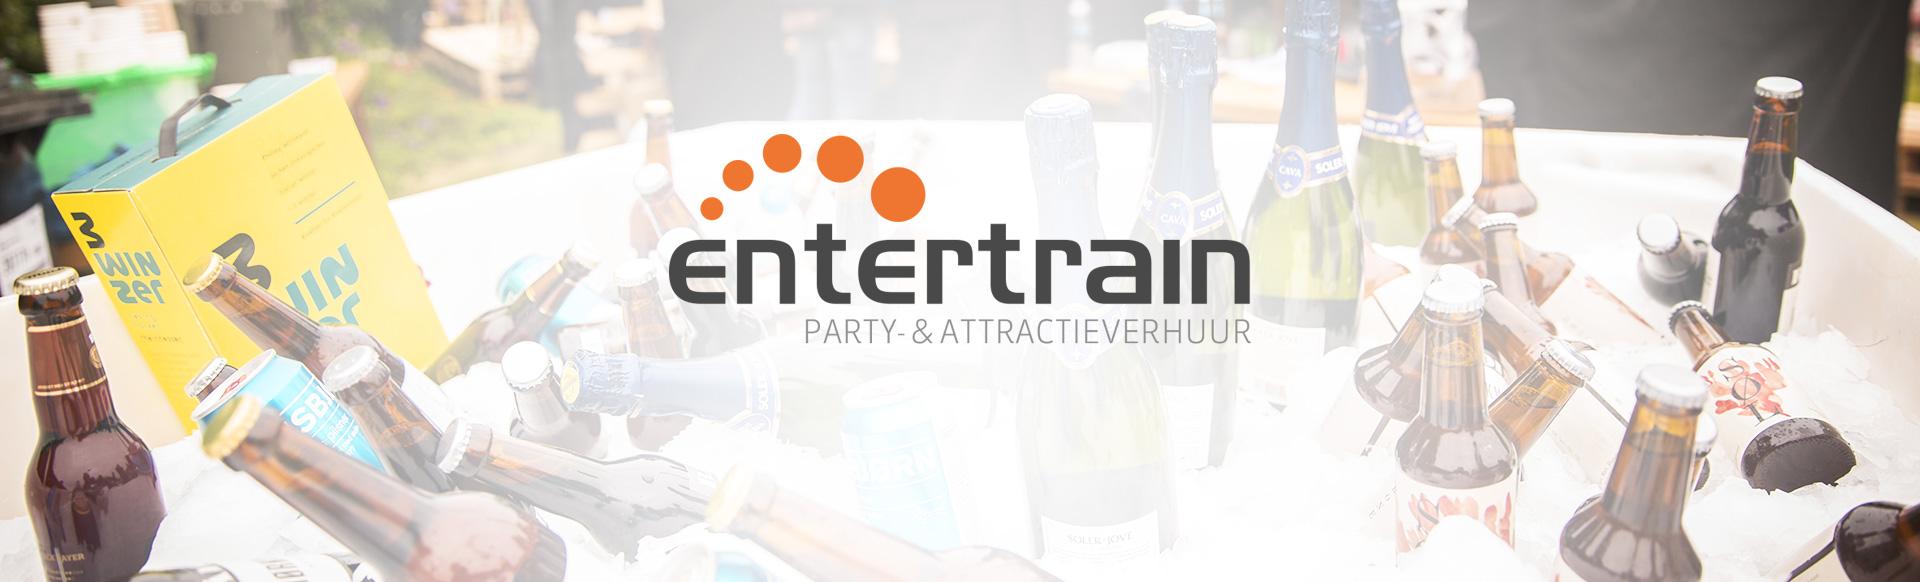 Entertrain-smallbanner-6